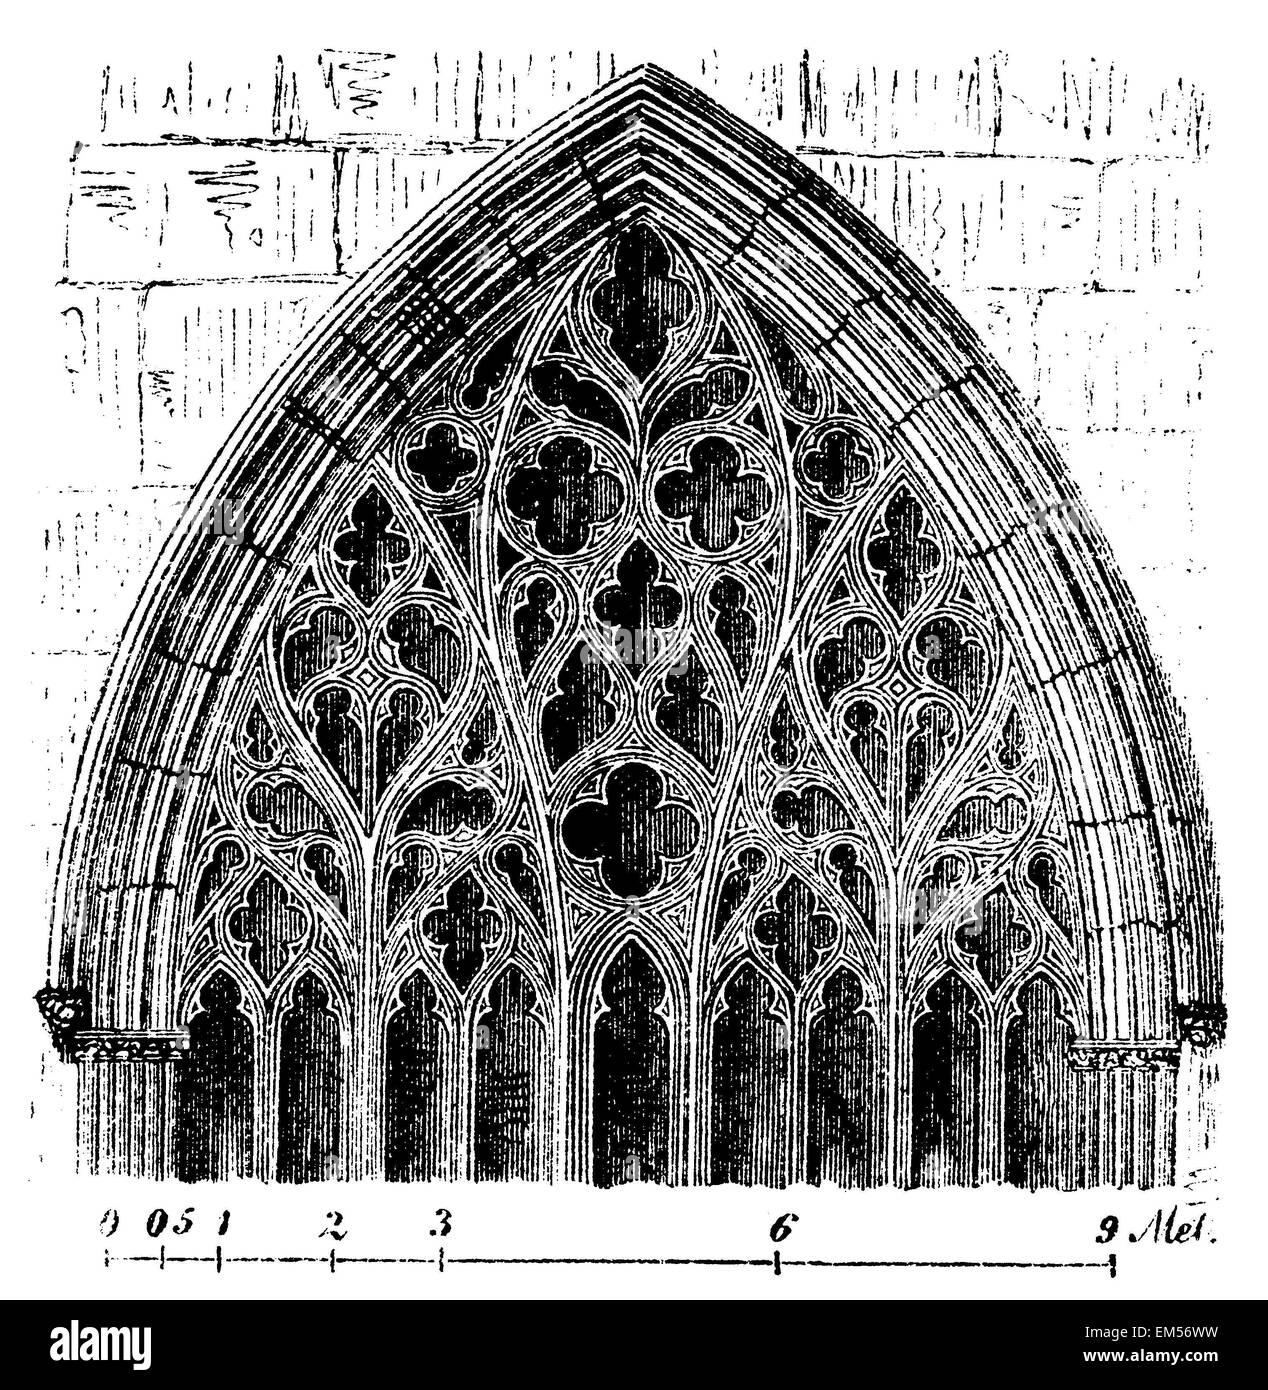 Carlisle Cathedral Window Florid Gothic English Architecture